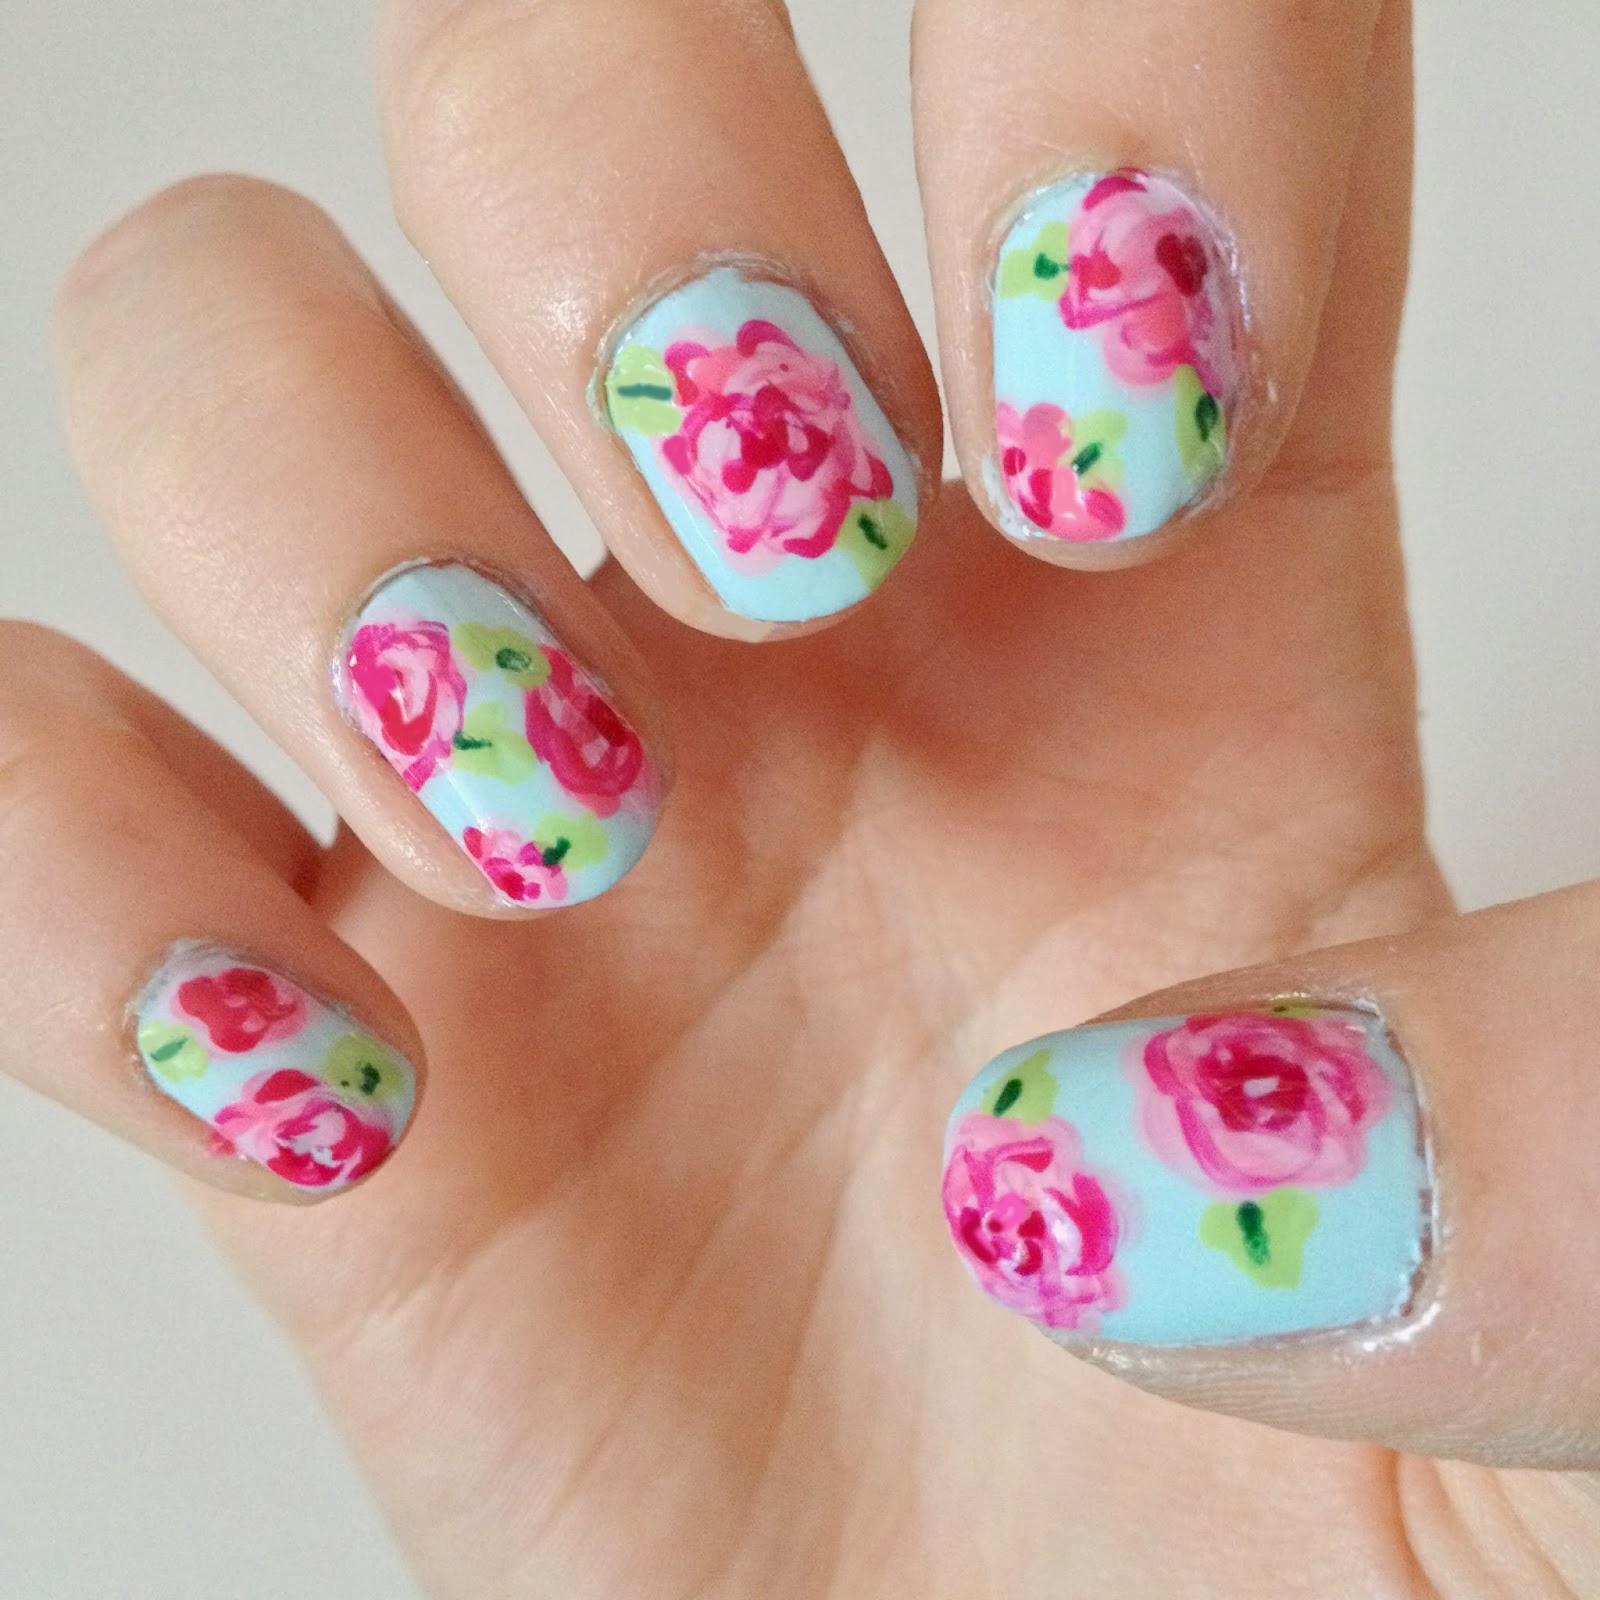 11 Radiant Rose Nail Art Designs